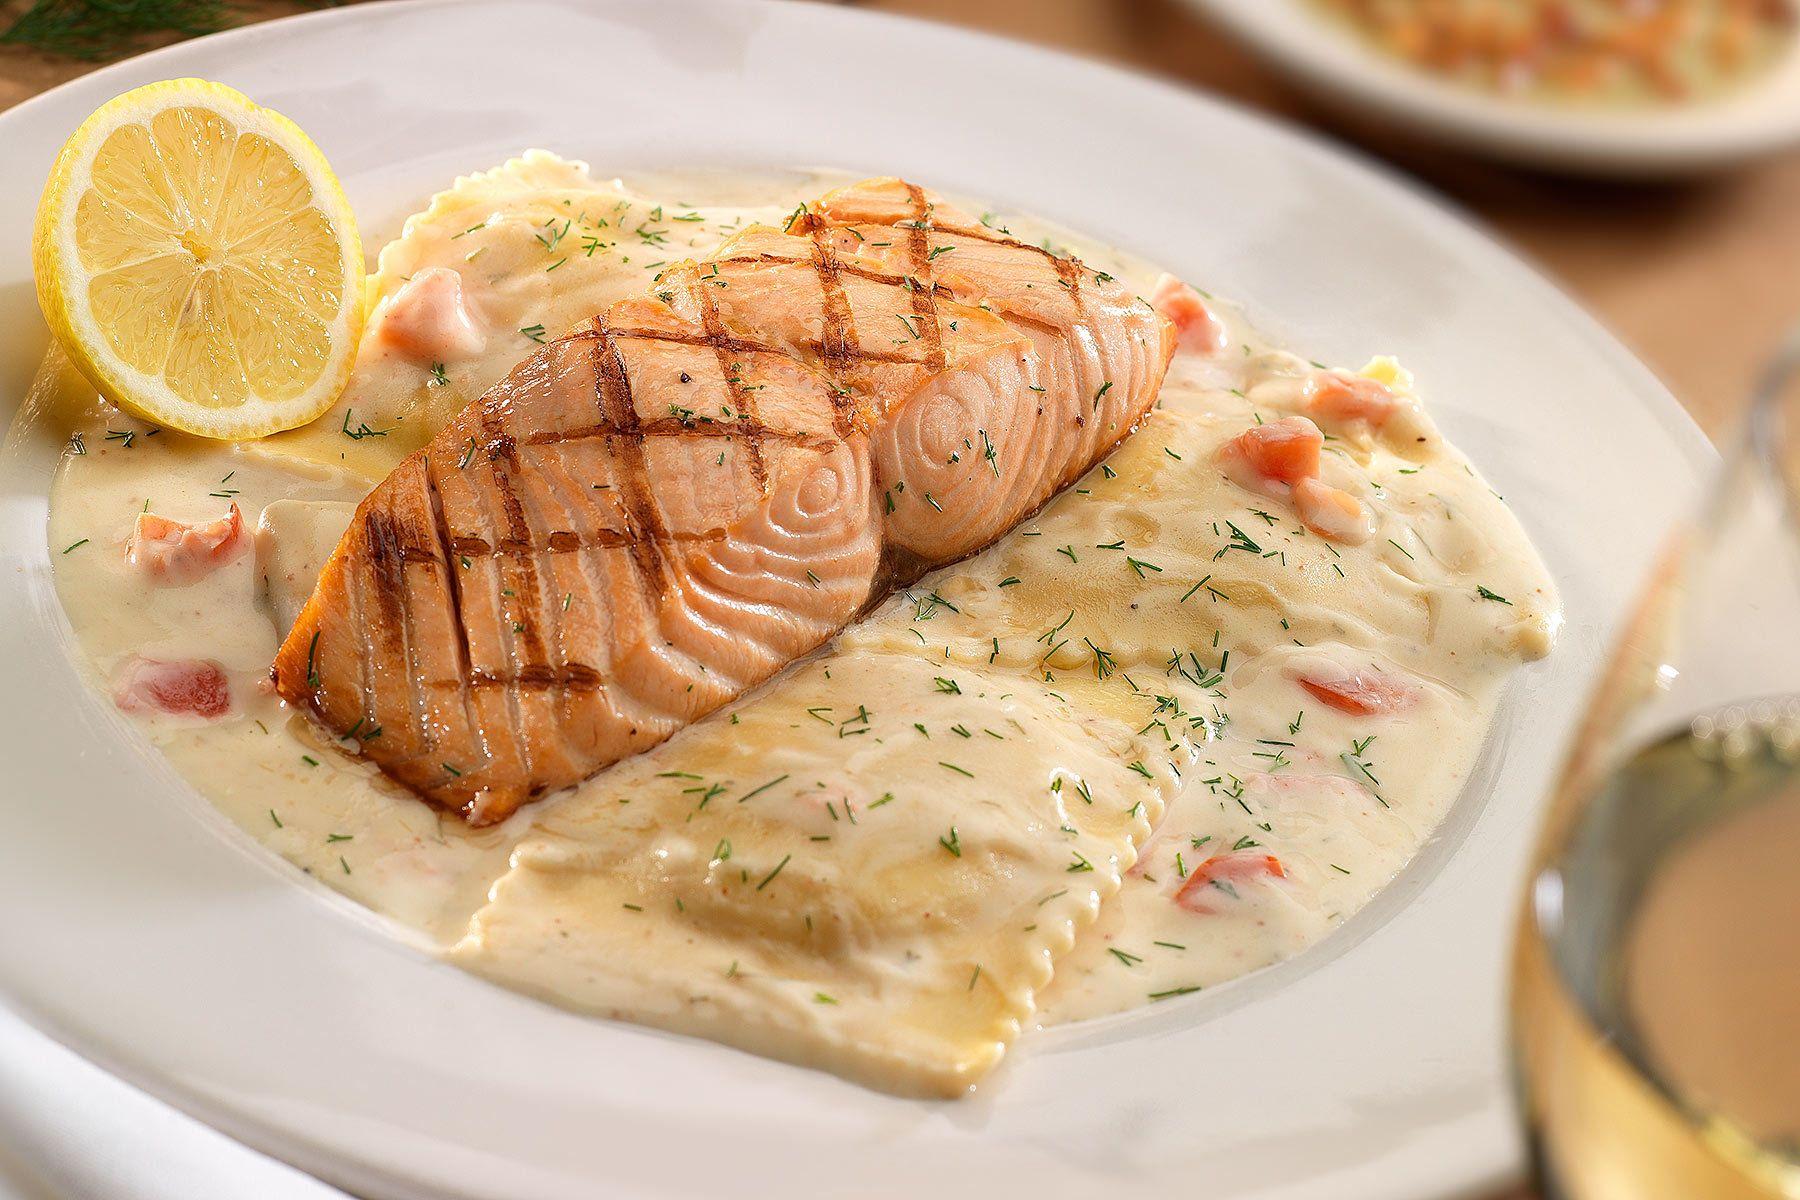 Salmon and ravioli dinner entree